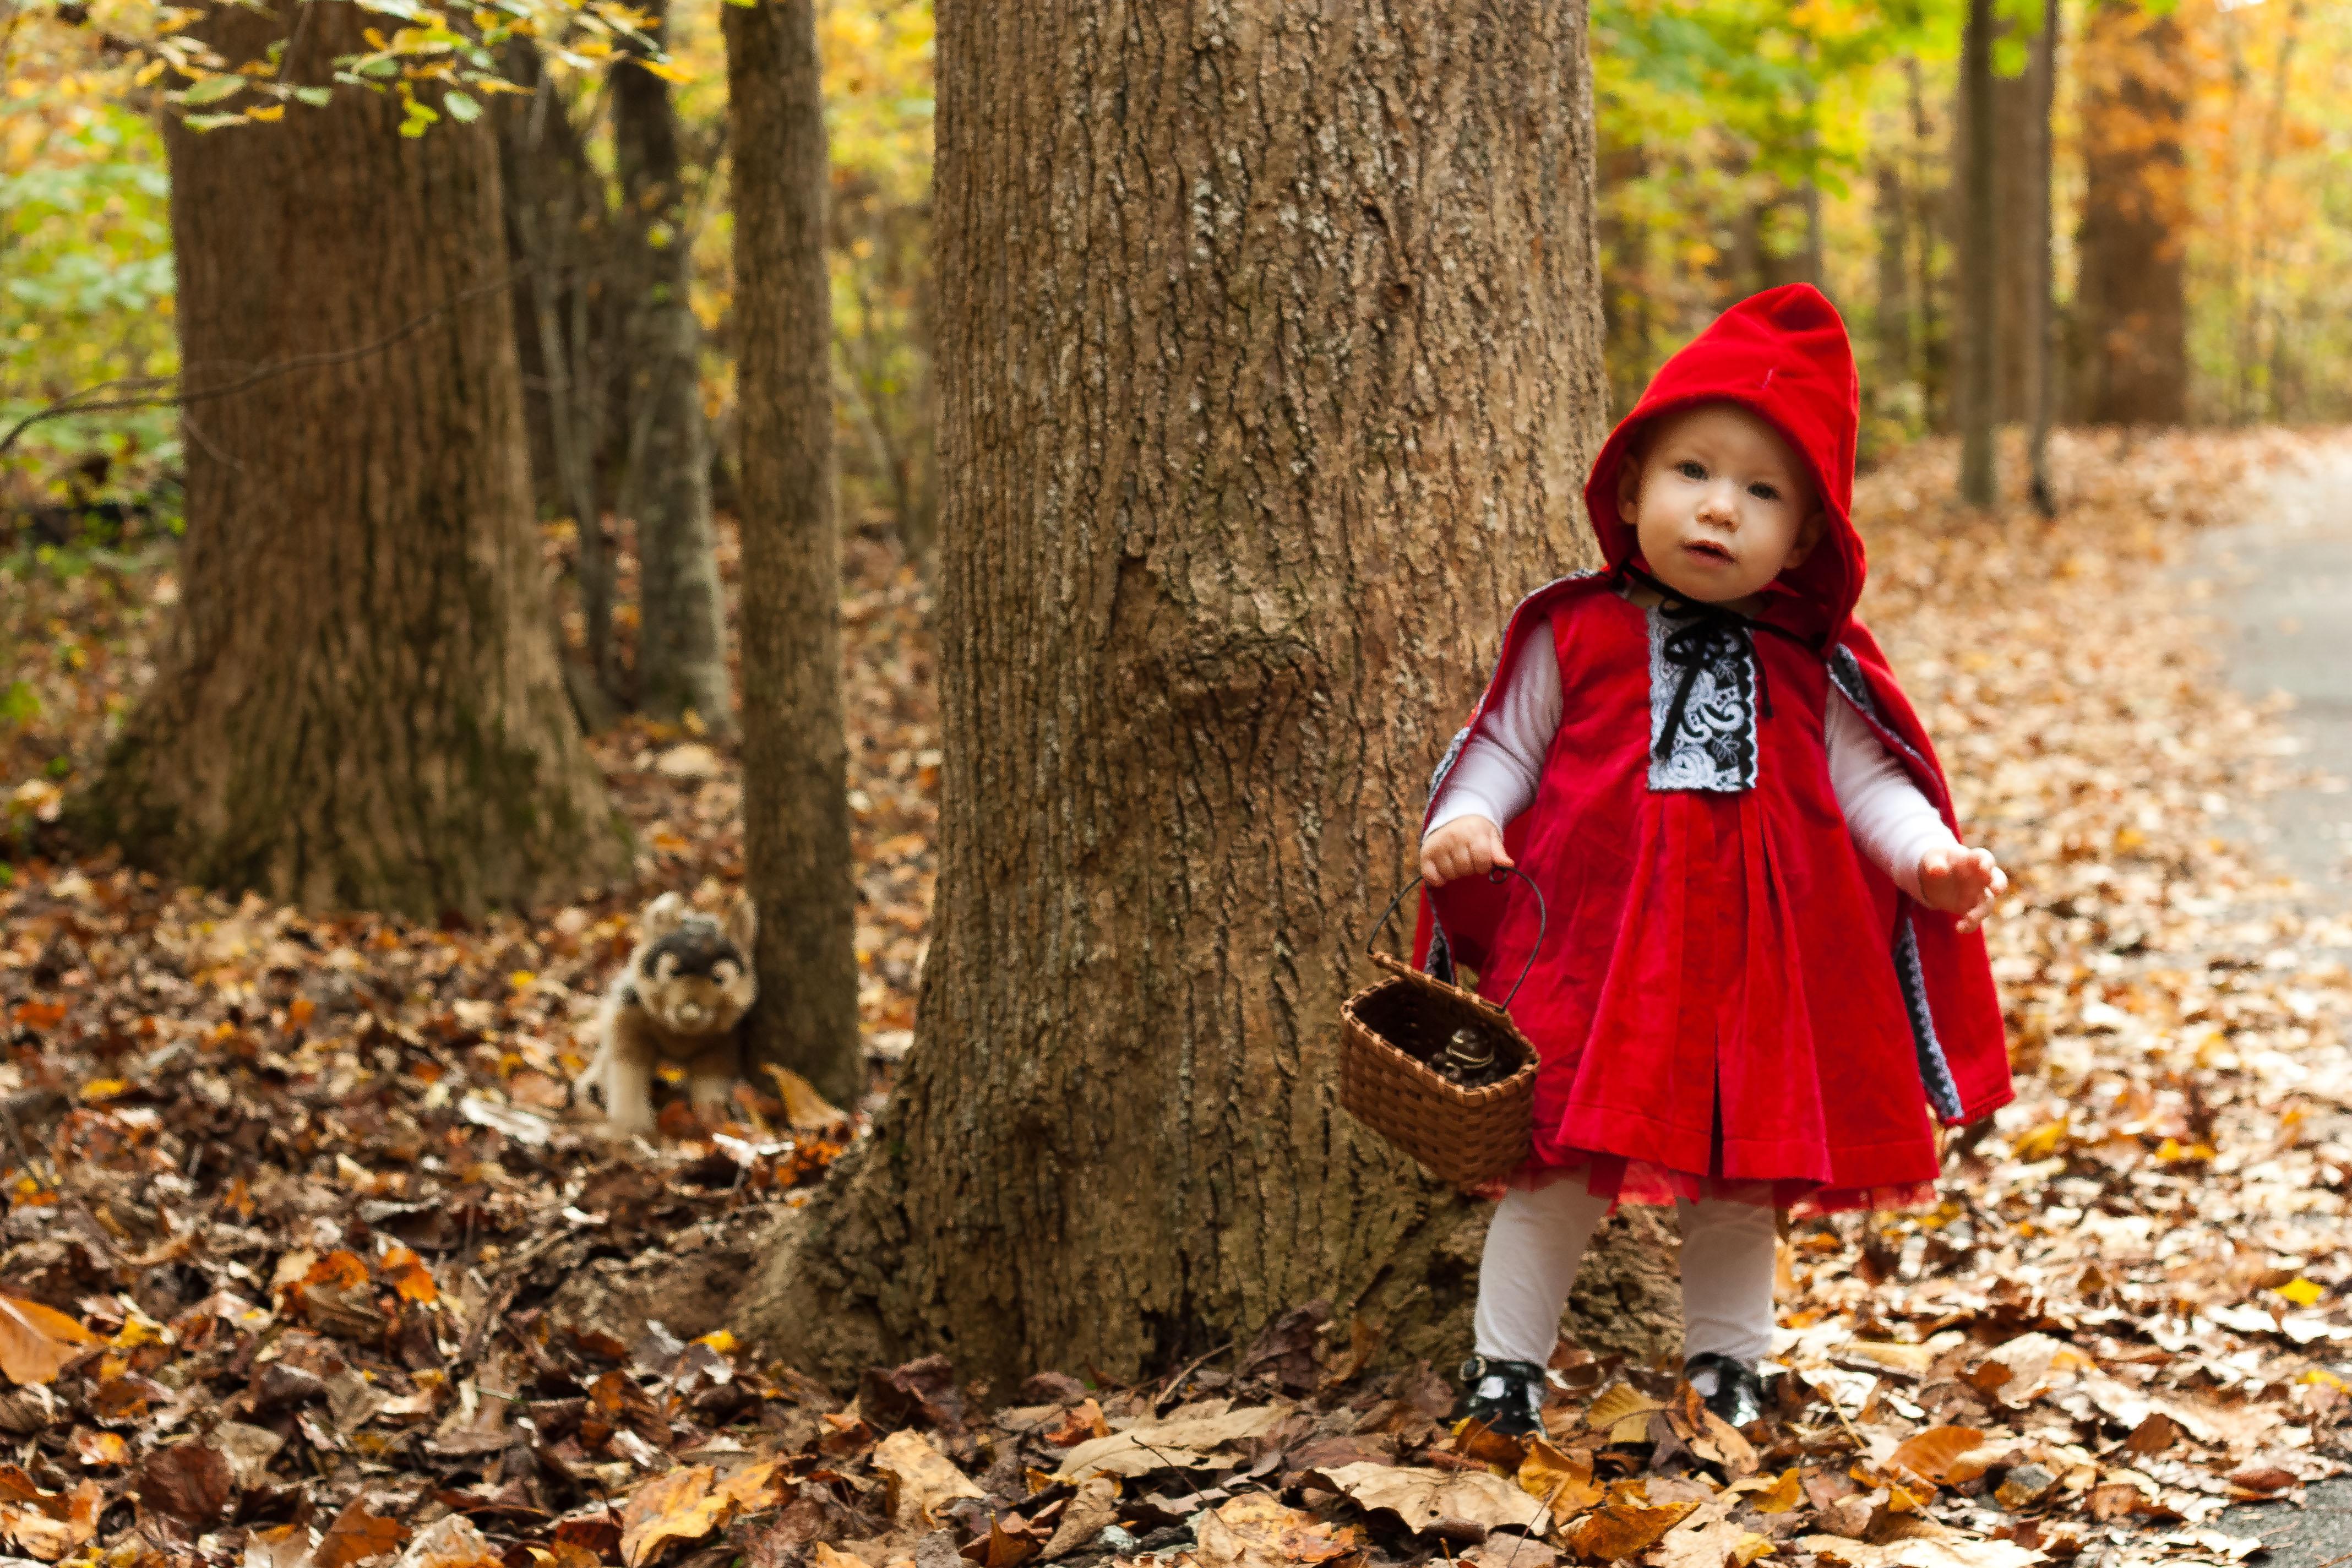 Little Red Riding Hood Thrift Aesthetic